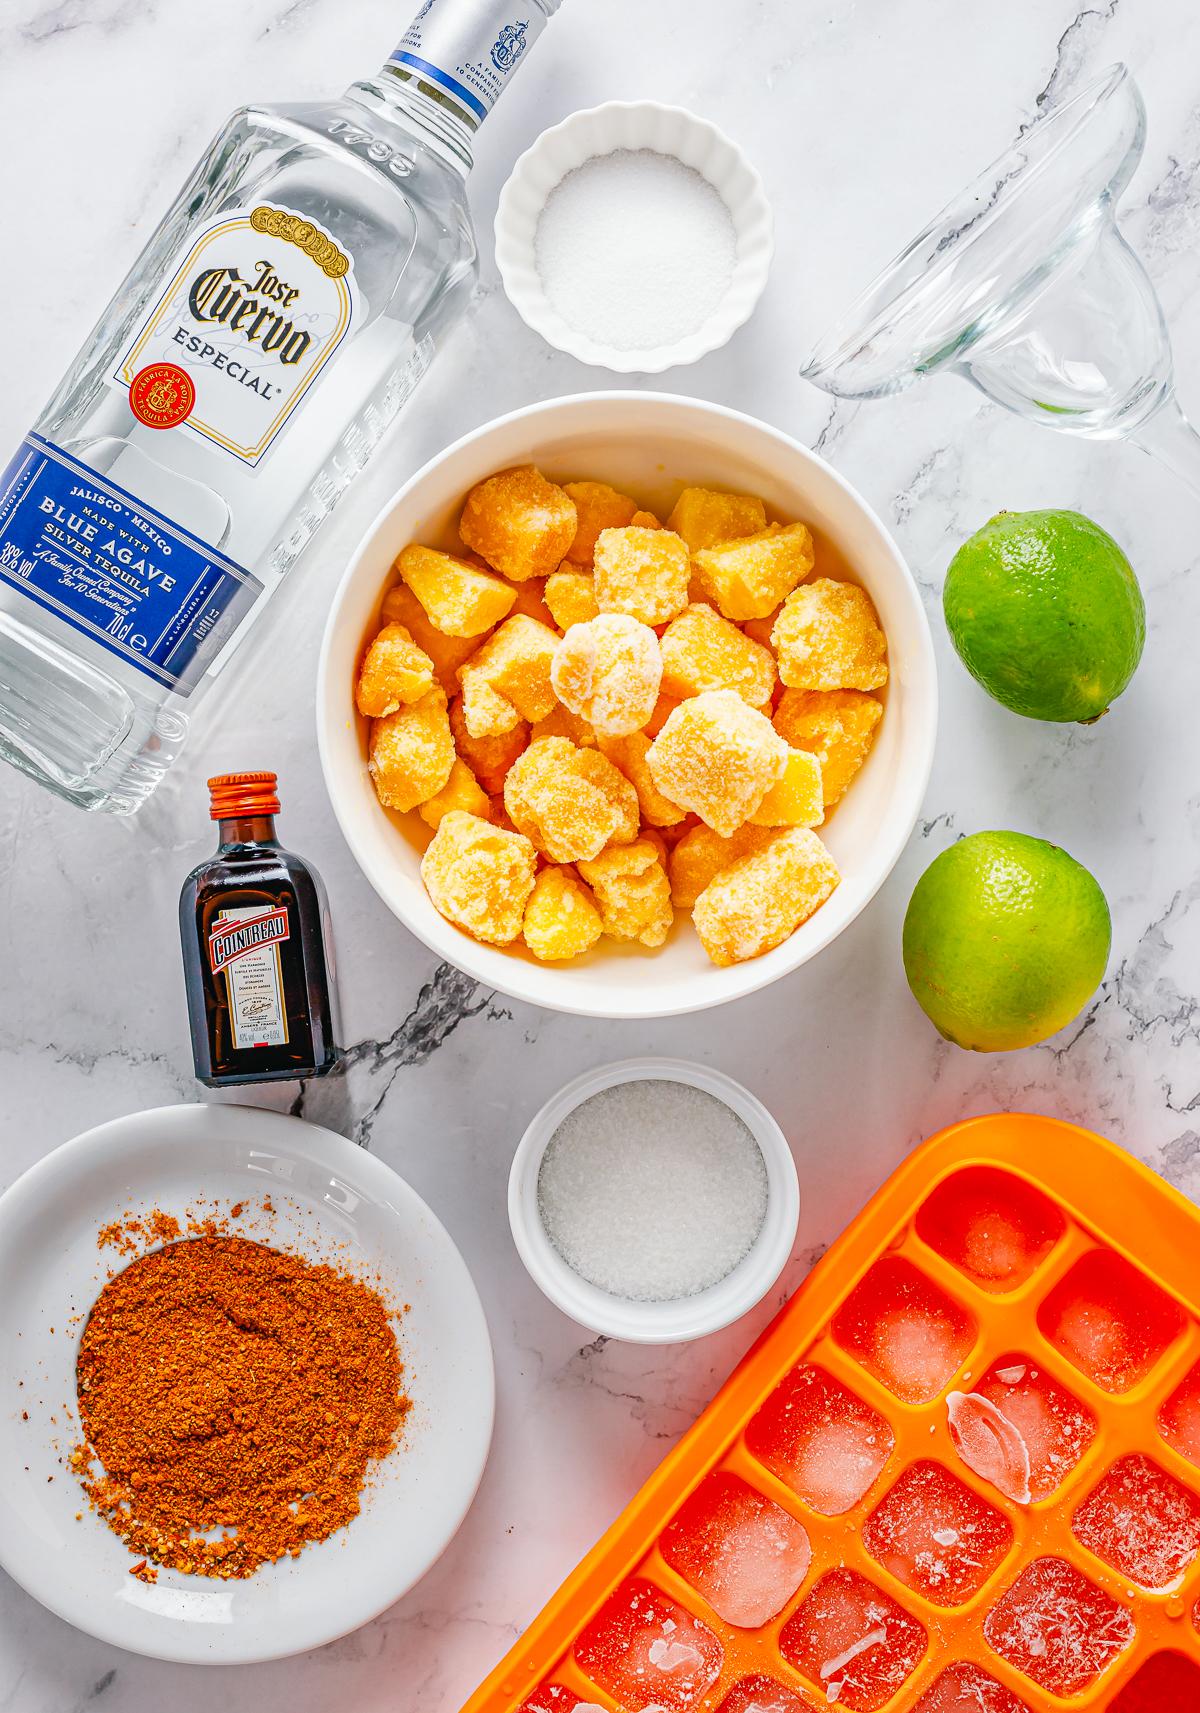 Ingredients needed to make Mango Margaritas